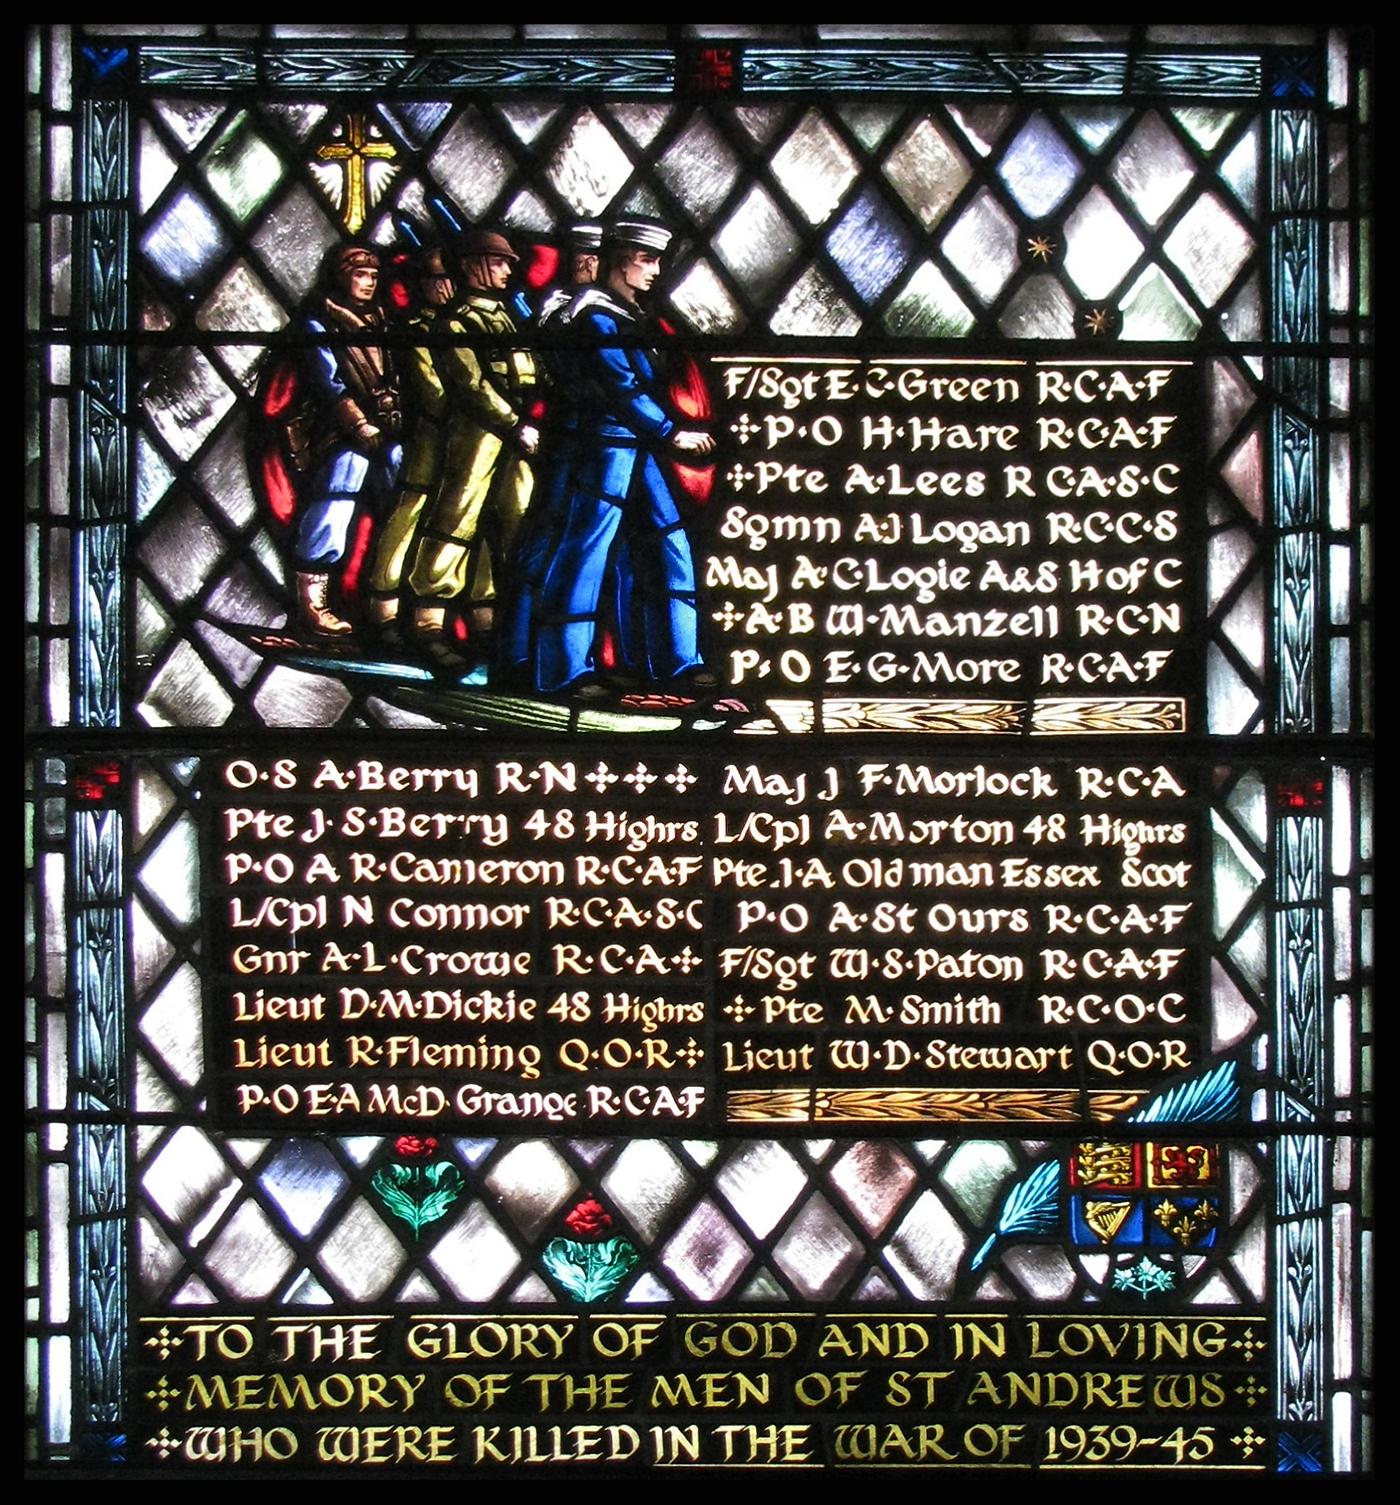 Memorial– St. Andrew's Church (Presbyterian), 73 Simcoe Street, Toronto